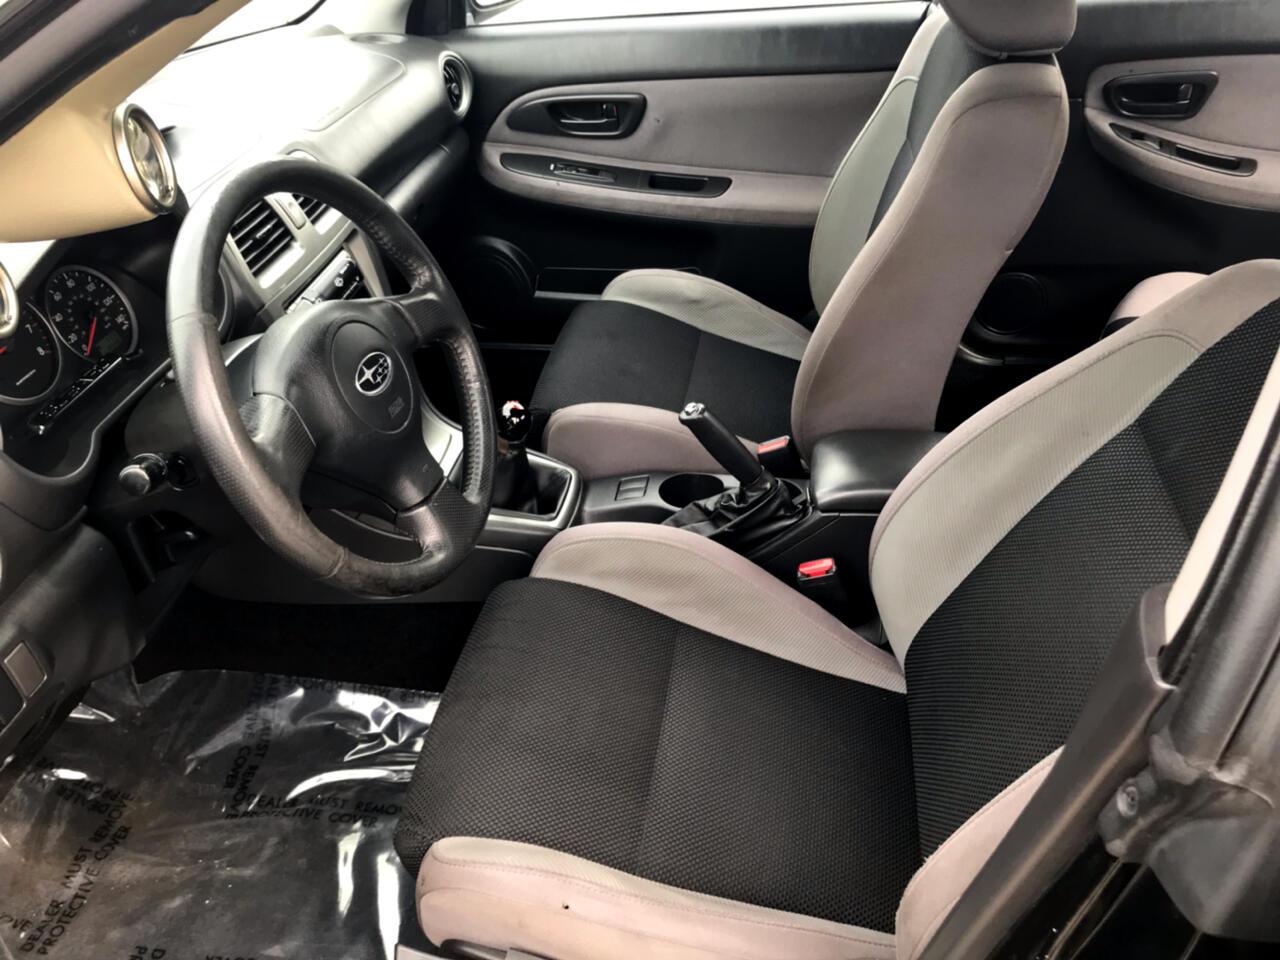 2006 Subaru Impreza WRX